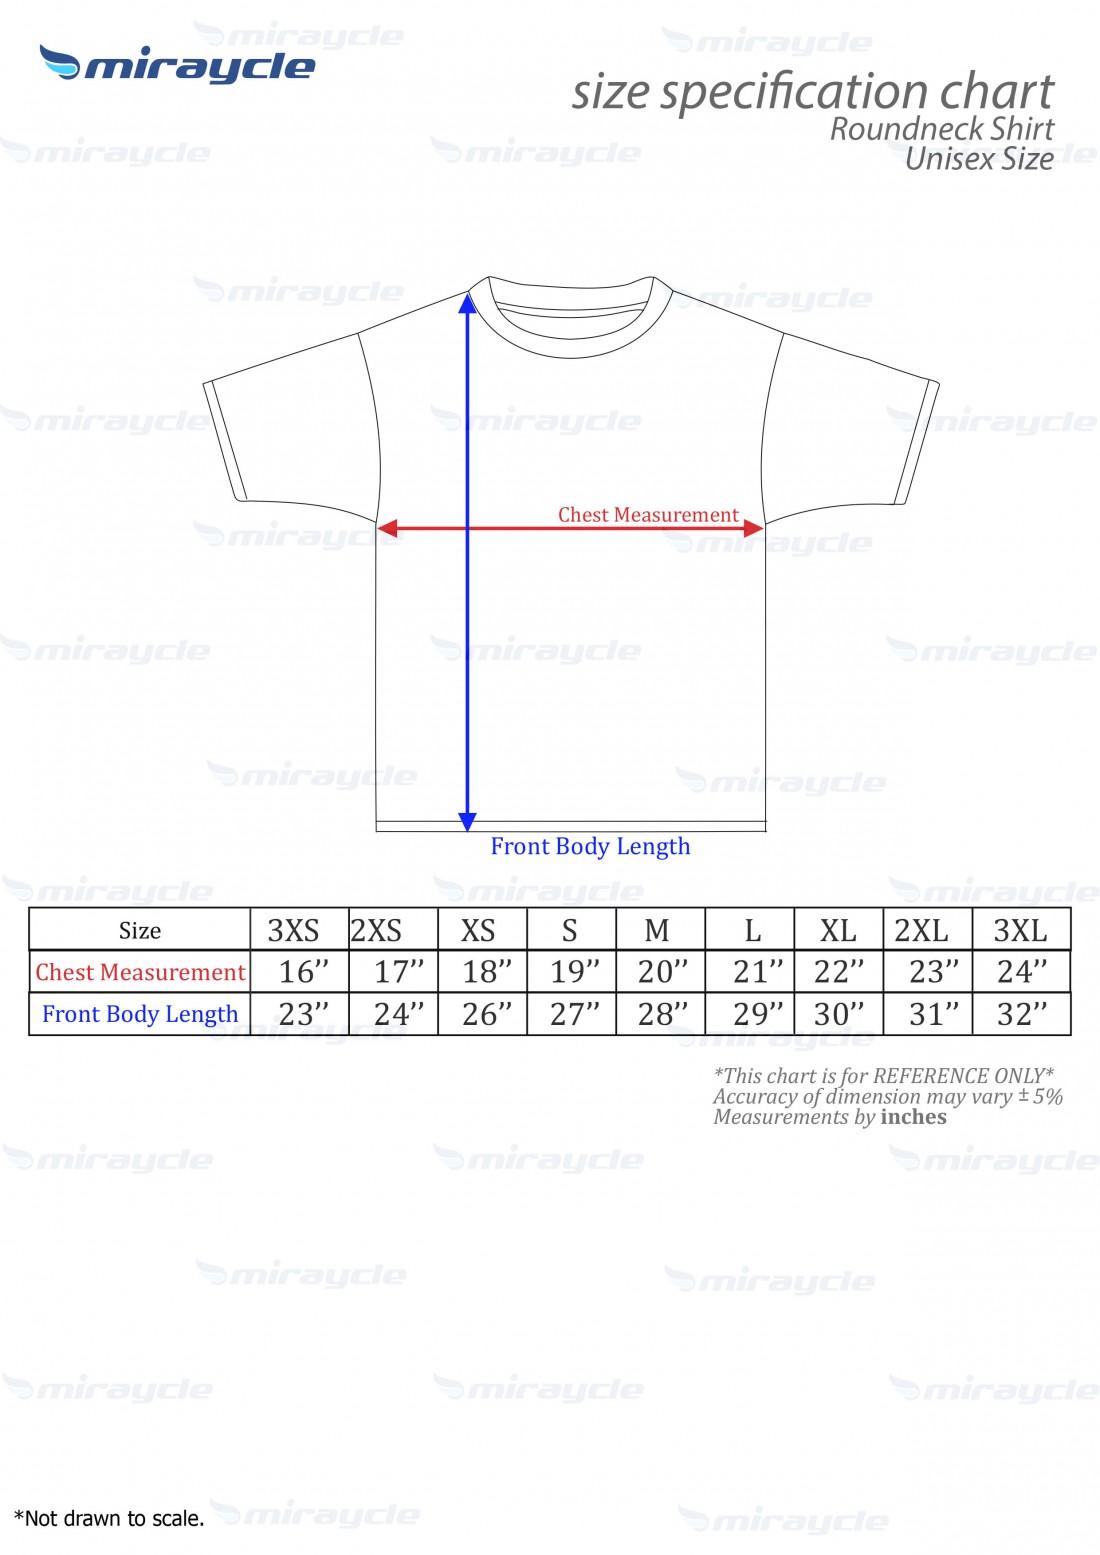 Unisex Roundneck Size Chart